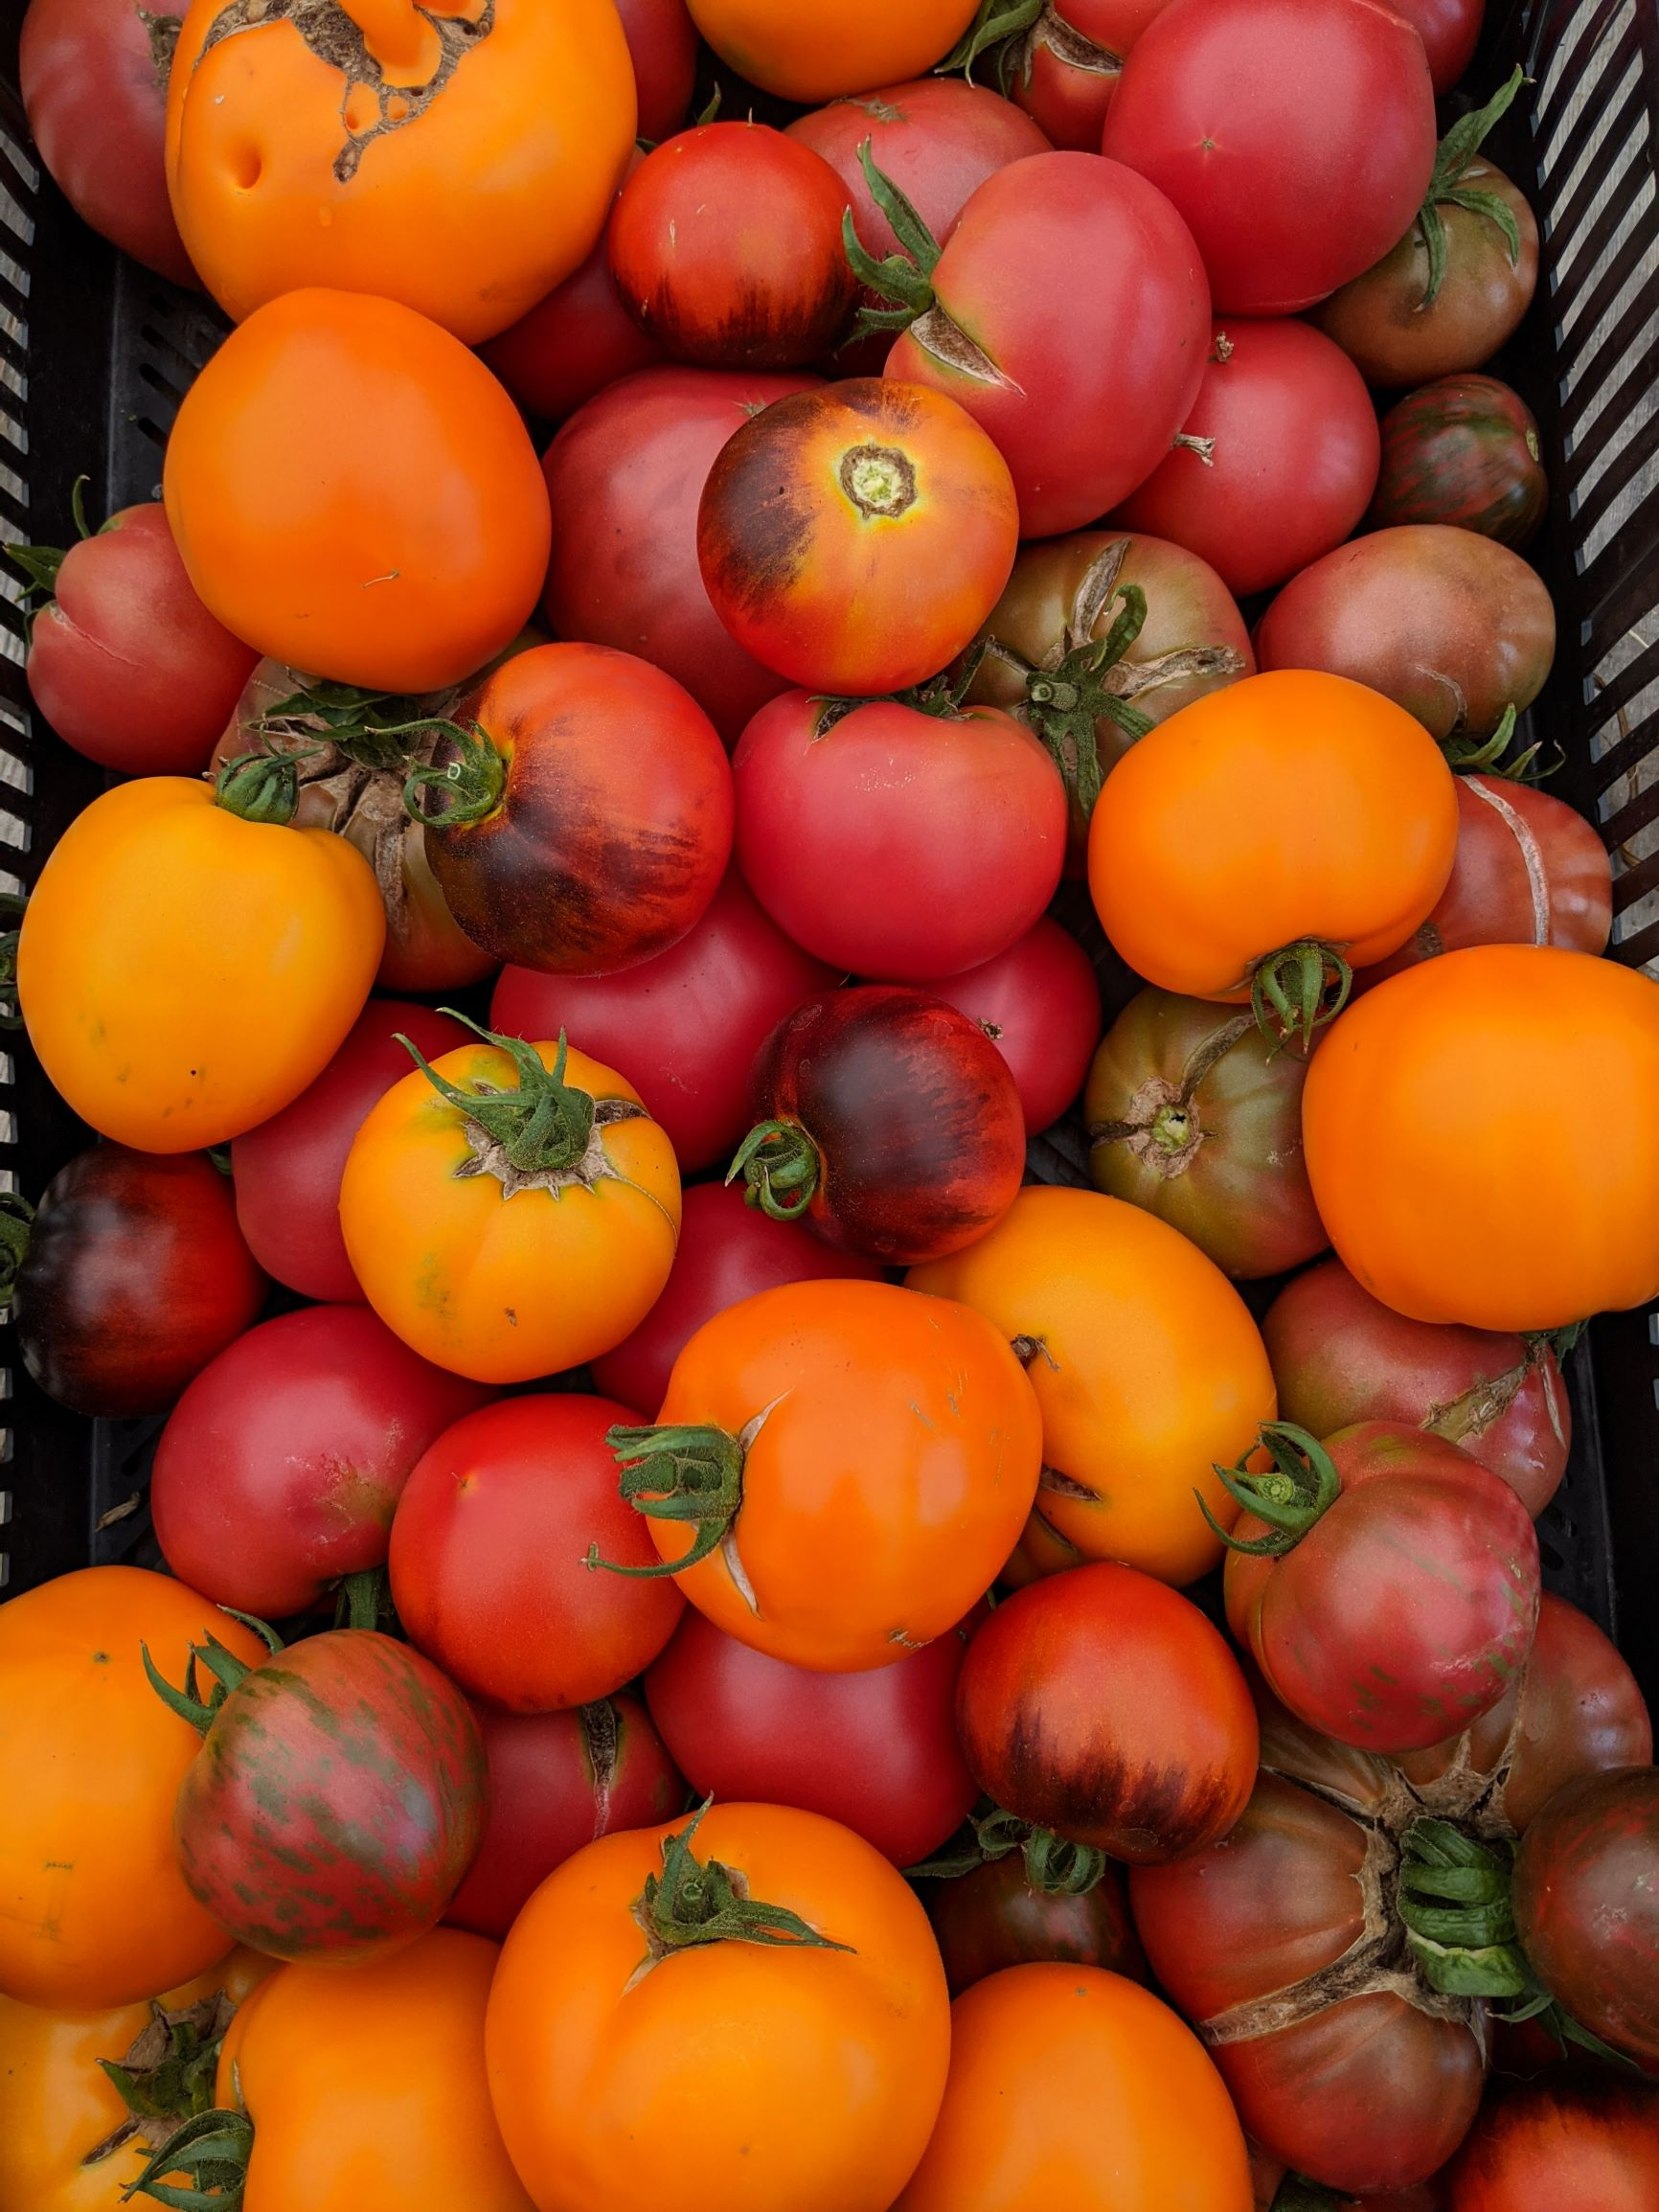 Farm Share Week 7 - Planting Time!